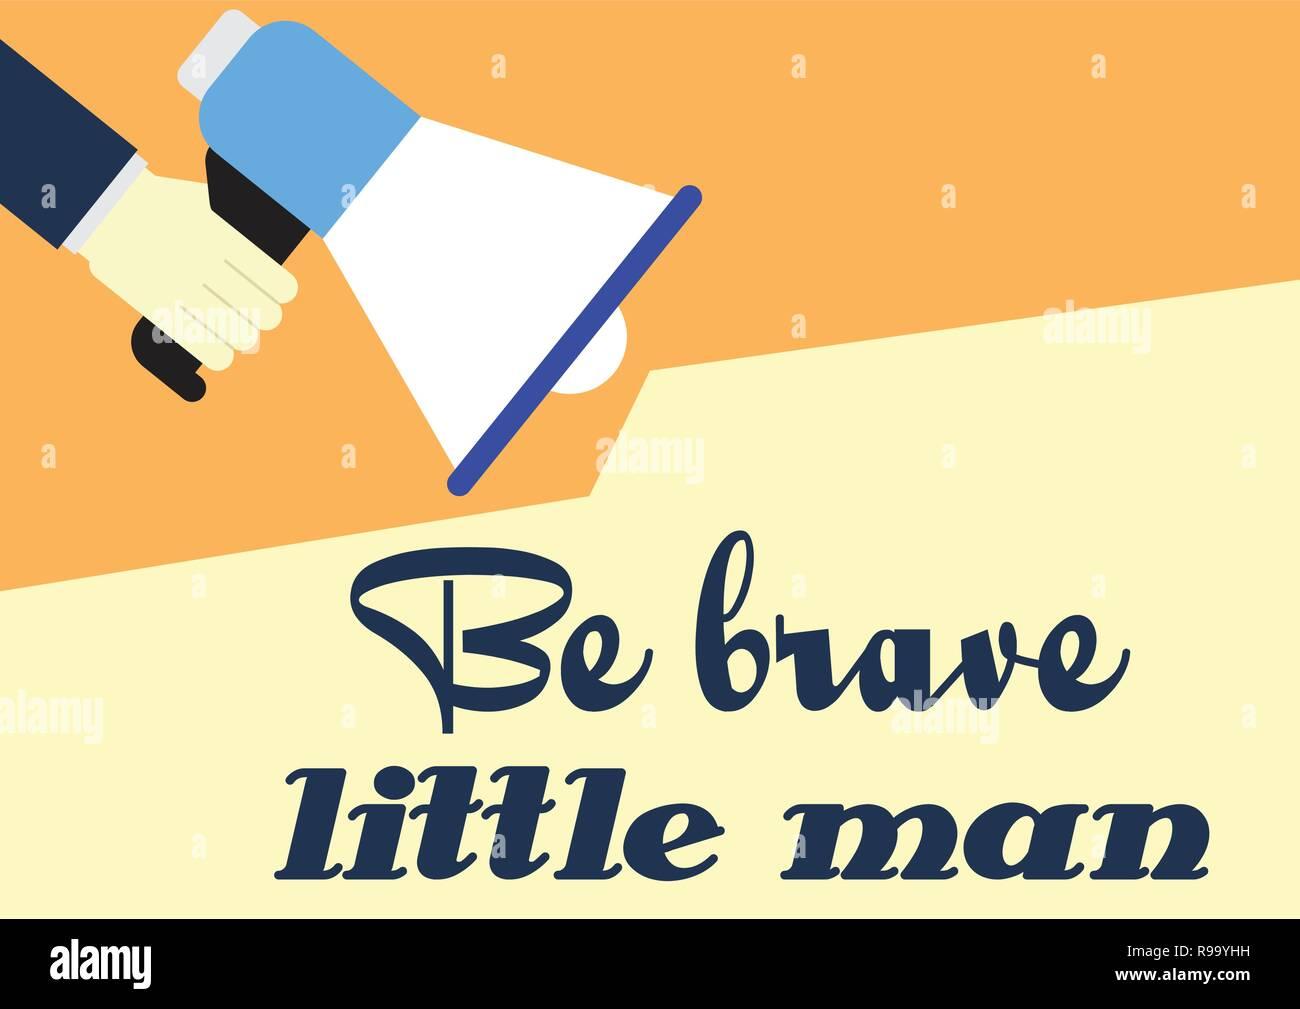 Be brave little man. Motivational phrase. Hand holding megaphone - Stock Vector